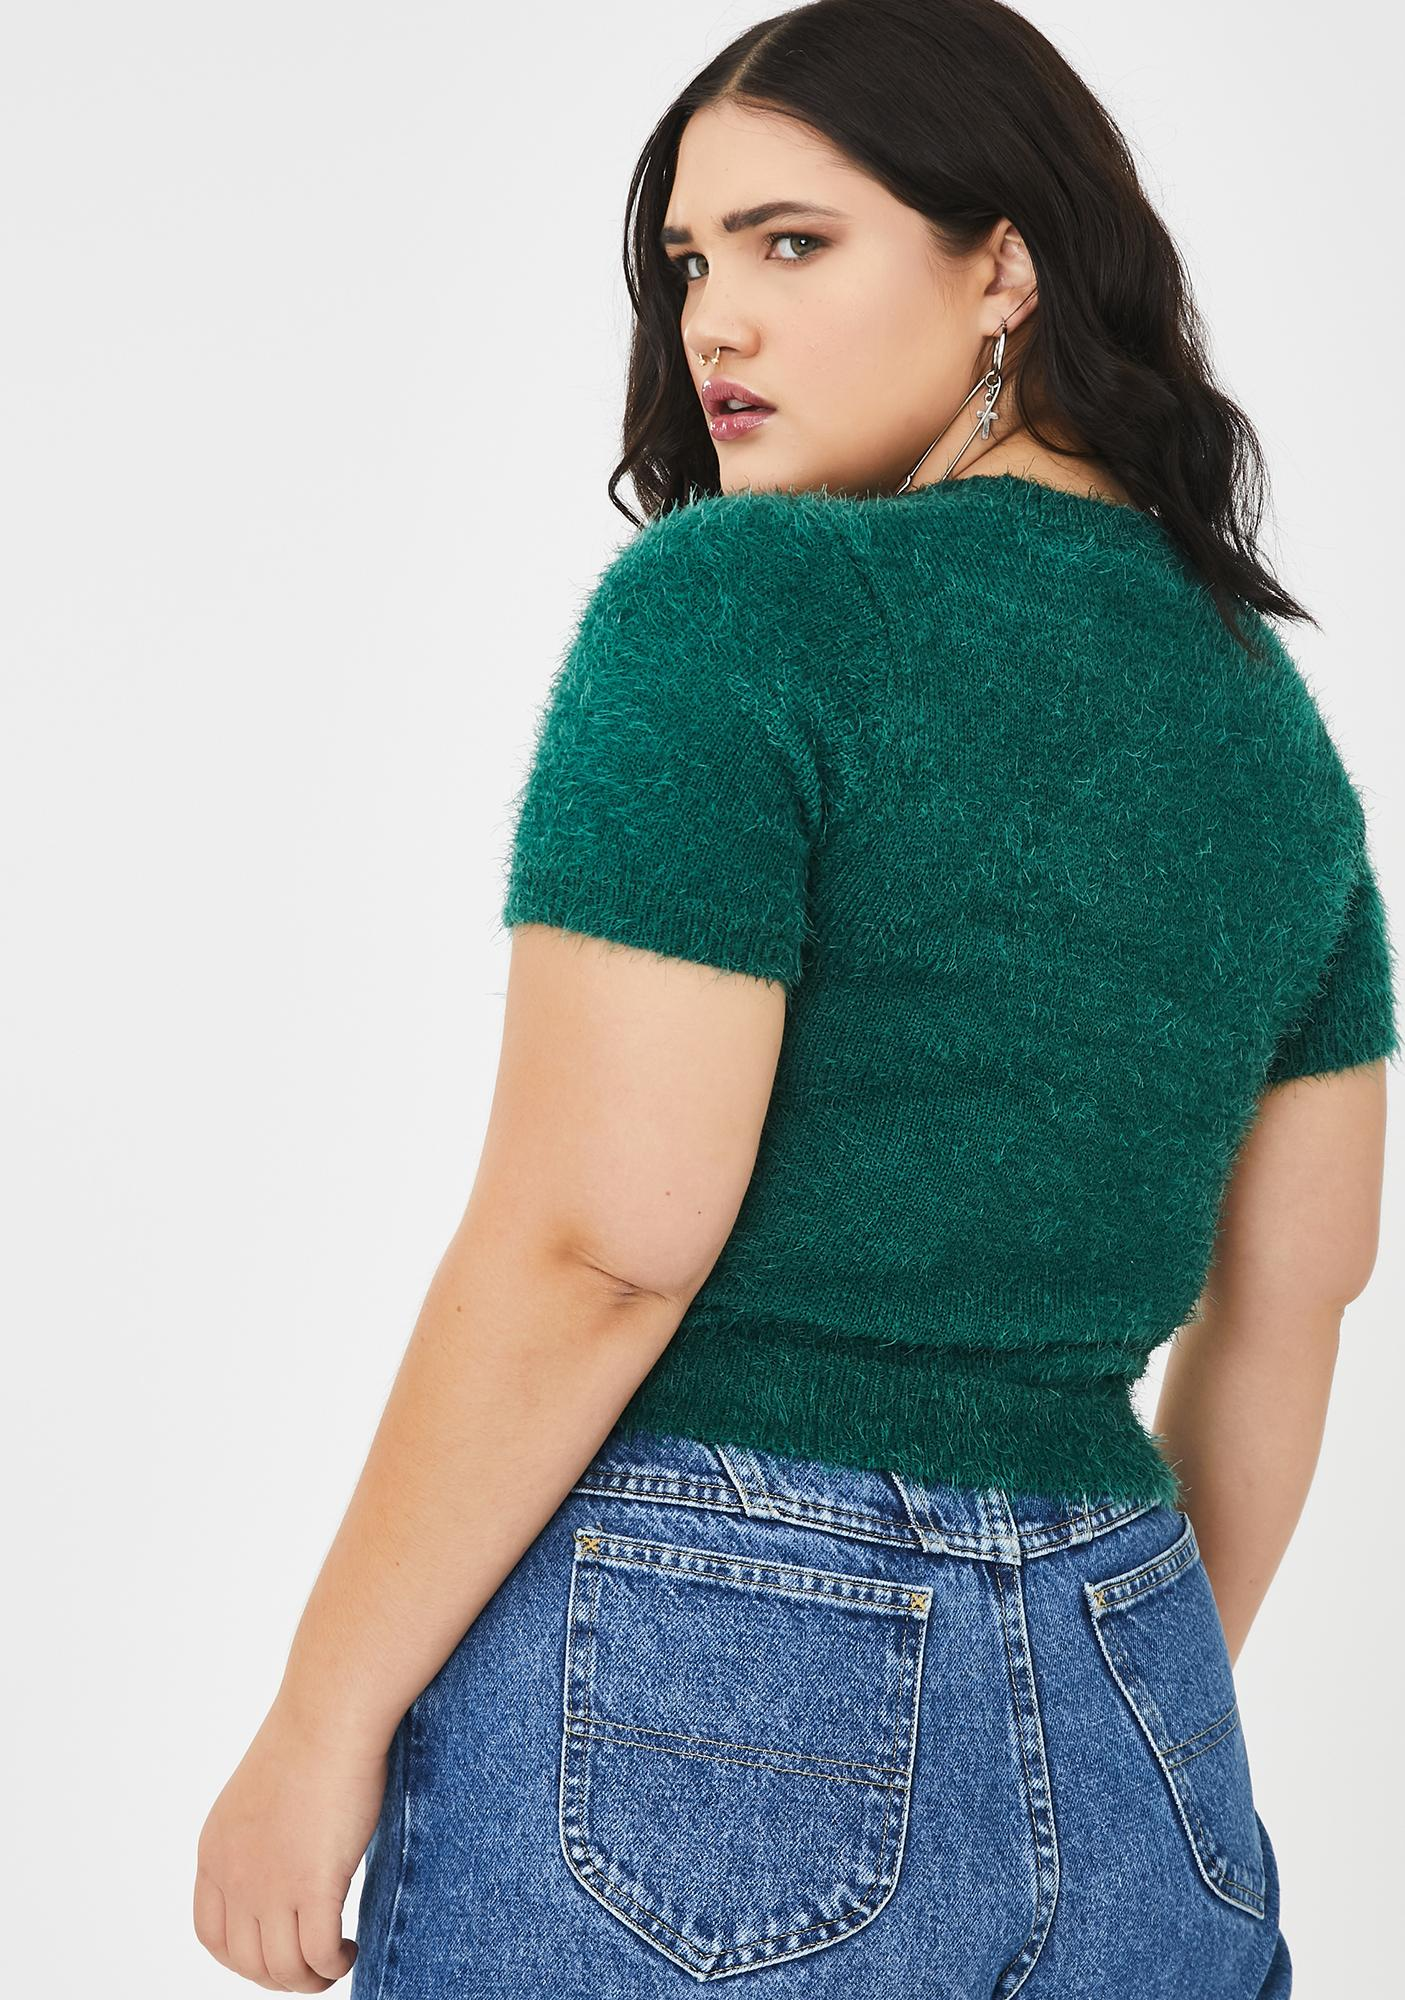 Current Mood Total Teacher's Pet Fuzzy Sweater